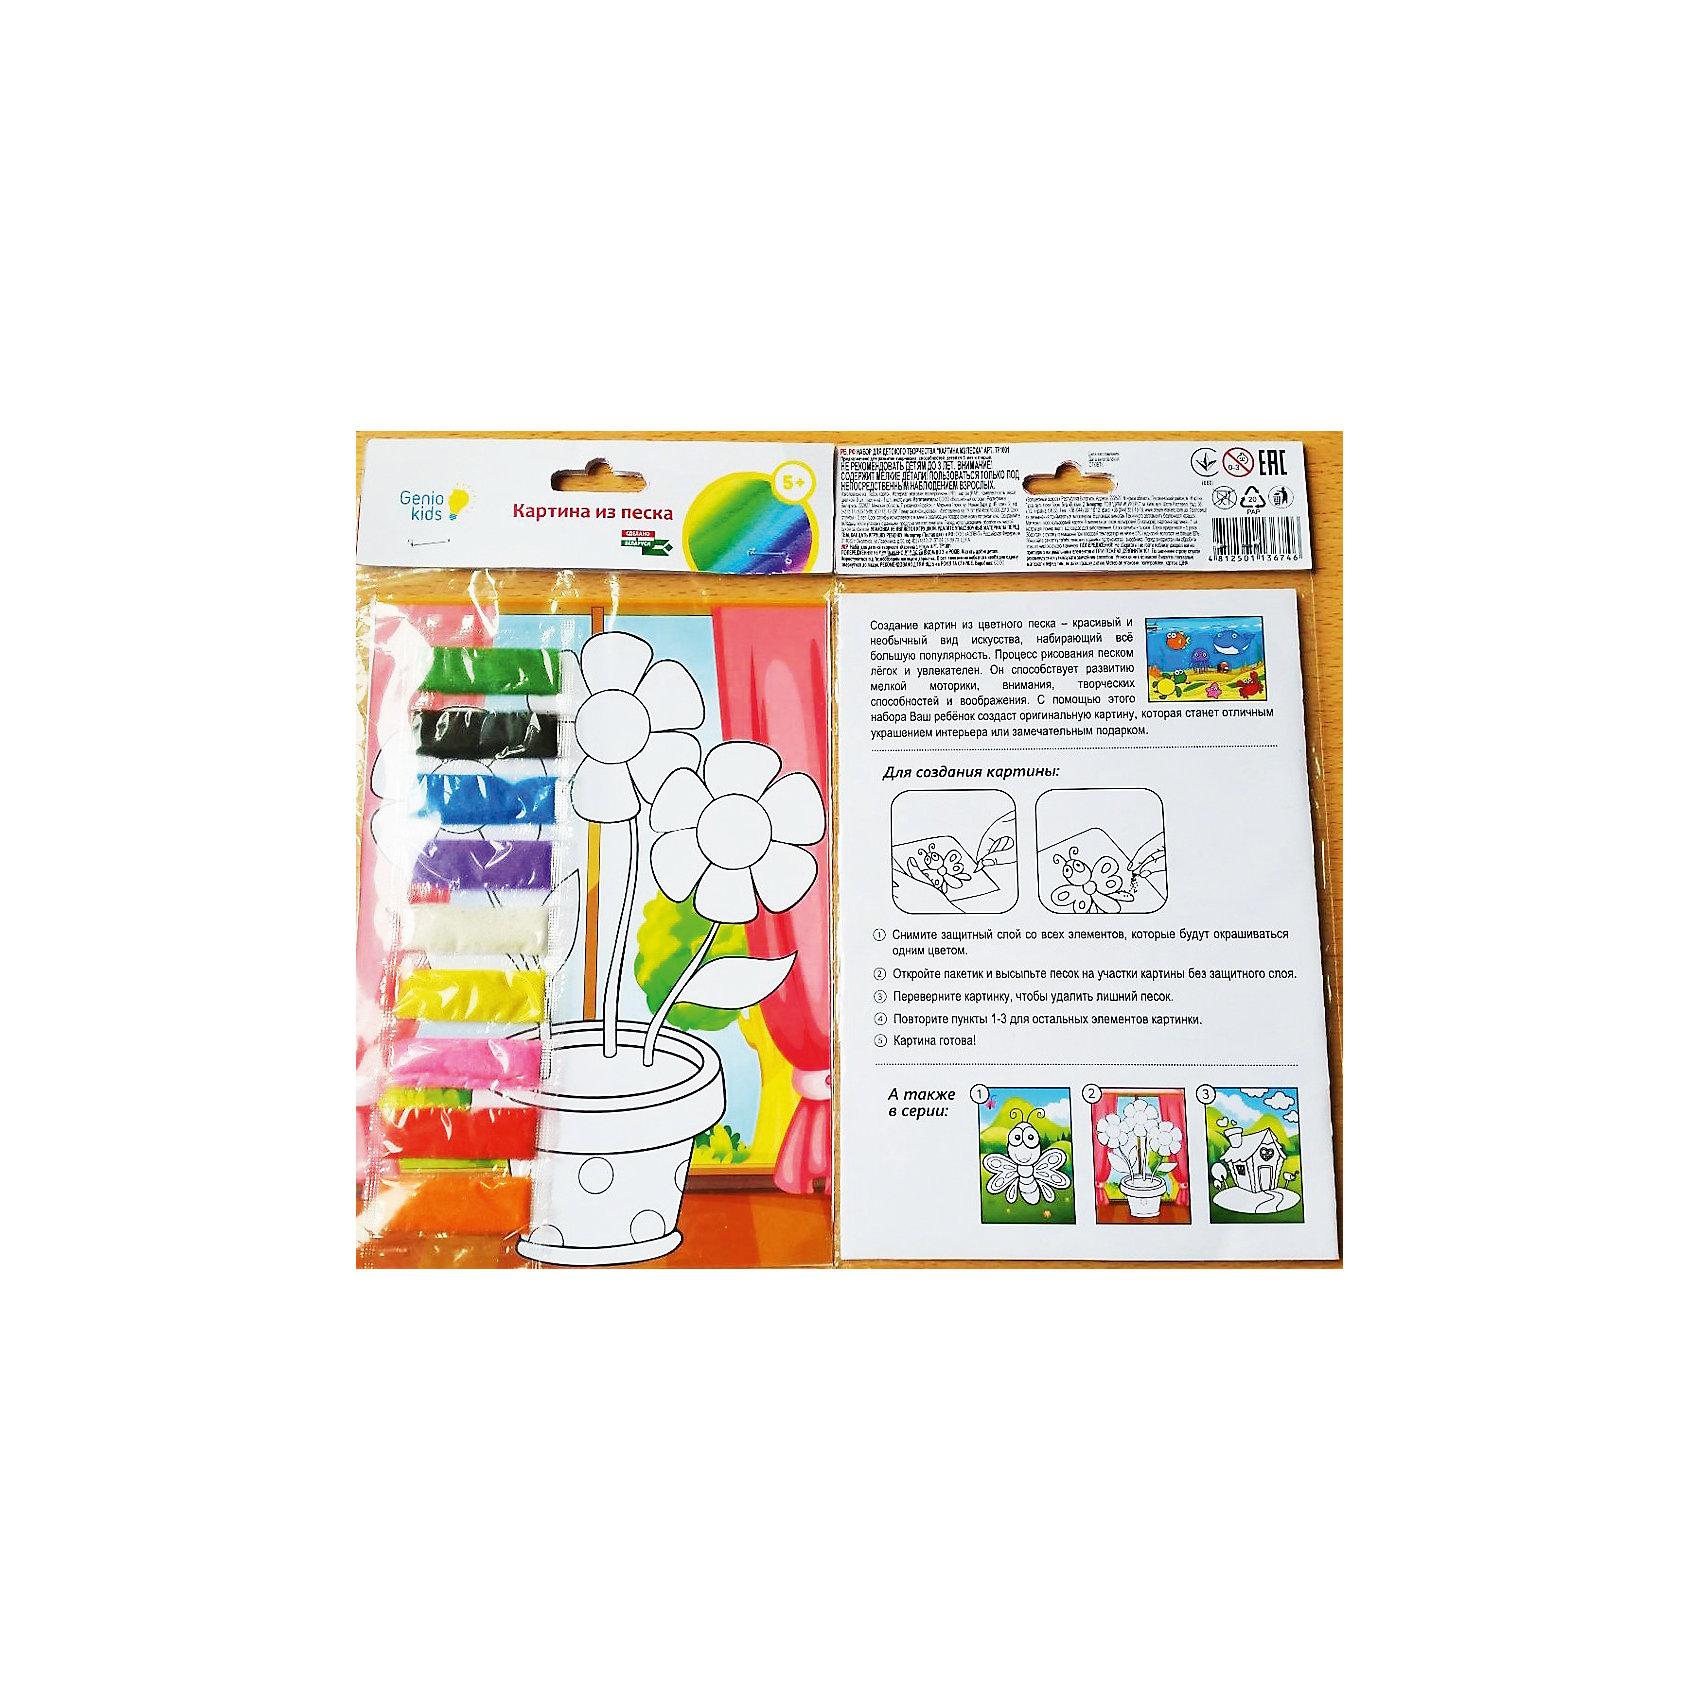 "Genio Kids Набор для детского творчества Картина из песка genio kids набор для детского творчества ""шкатулка"""